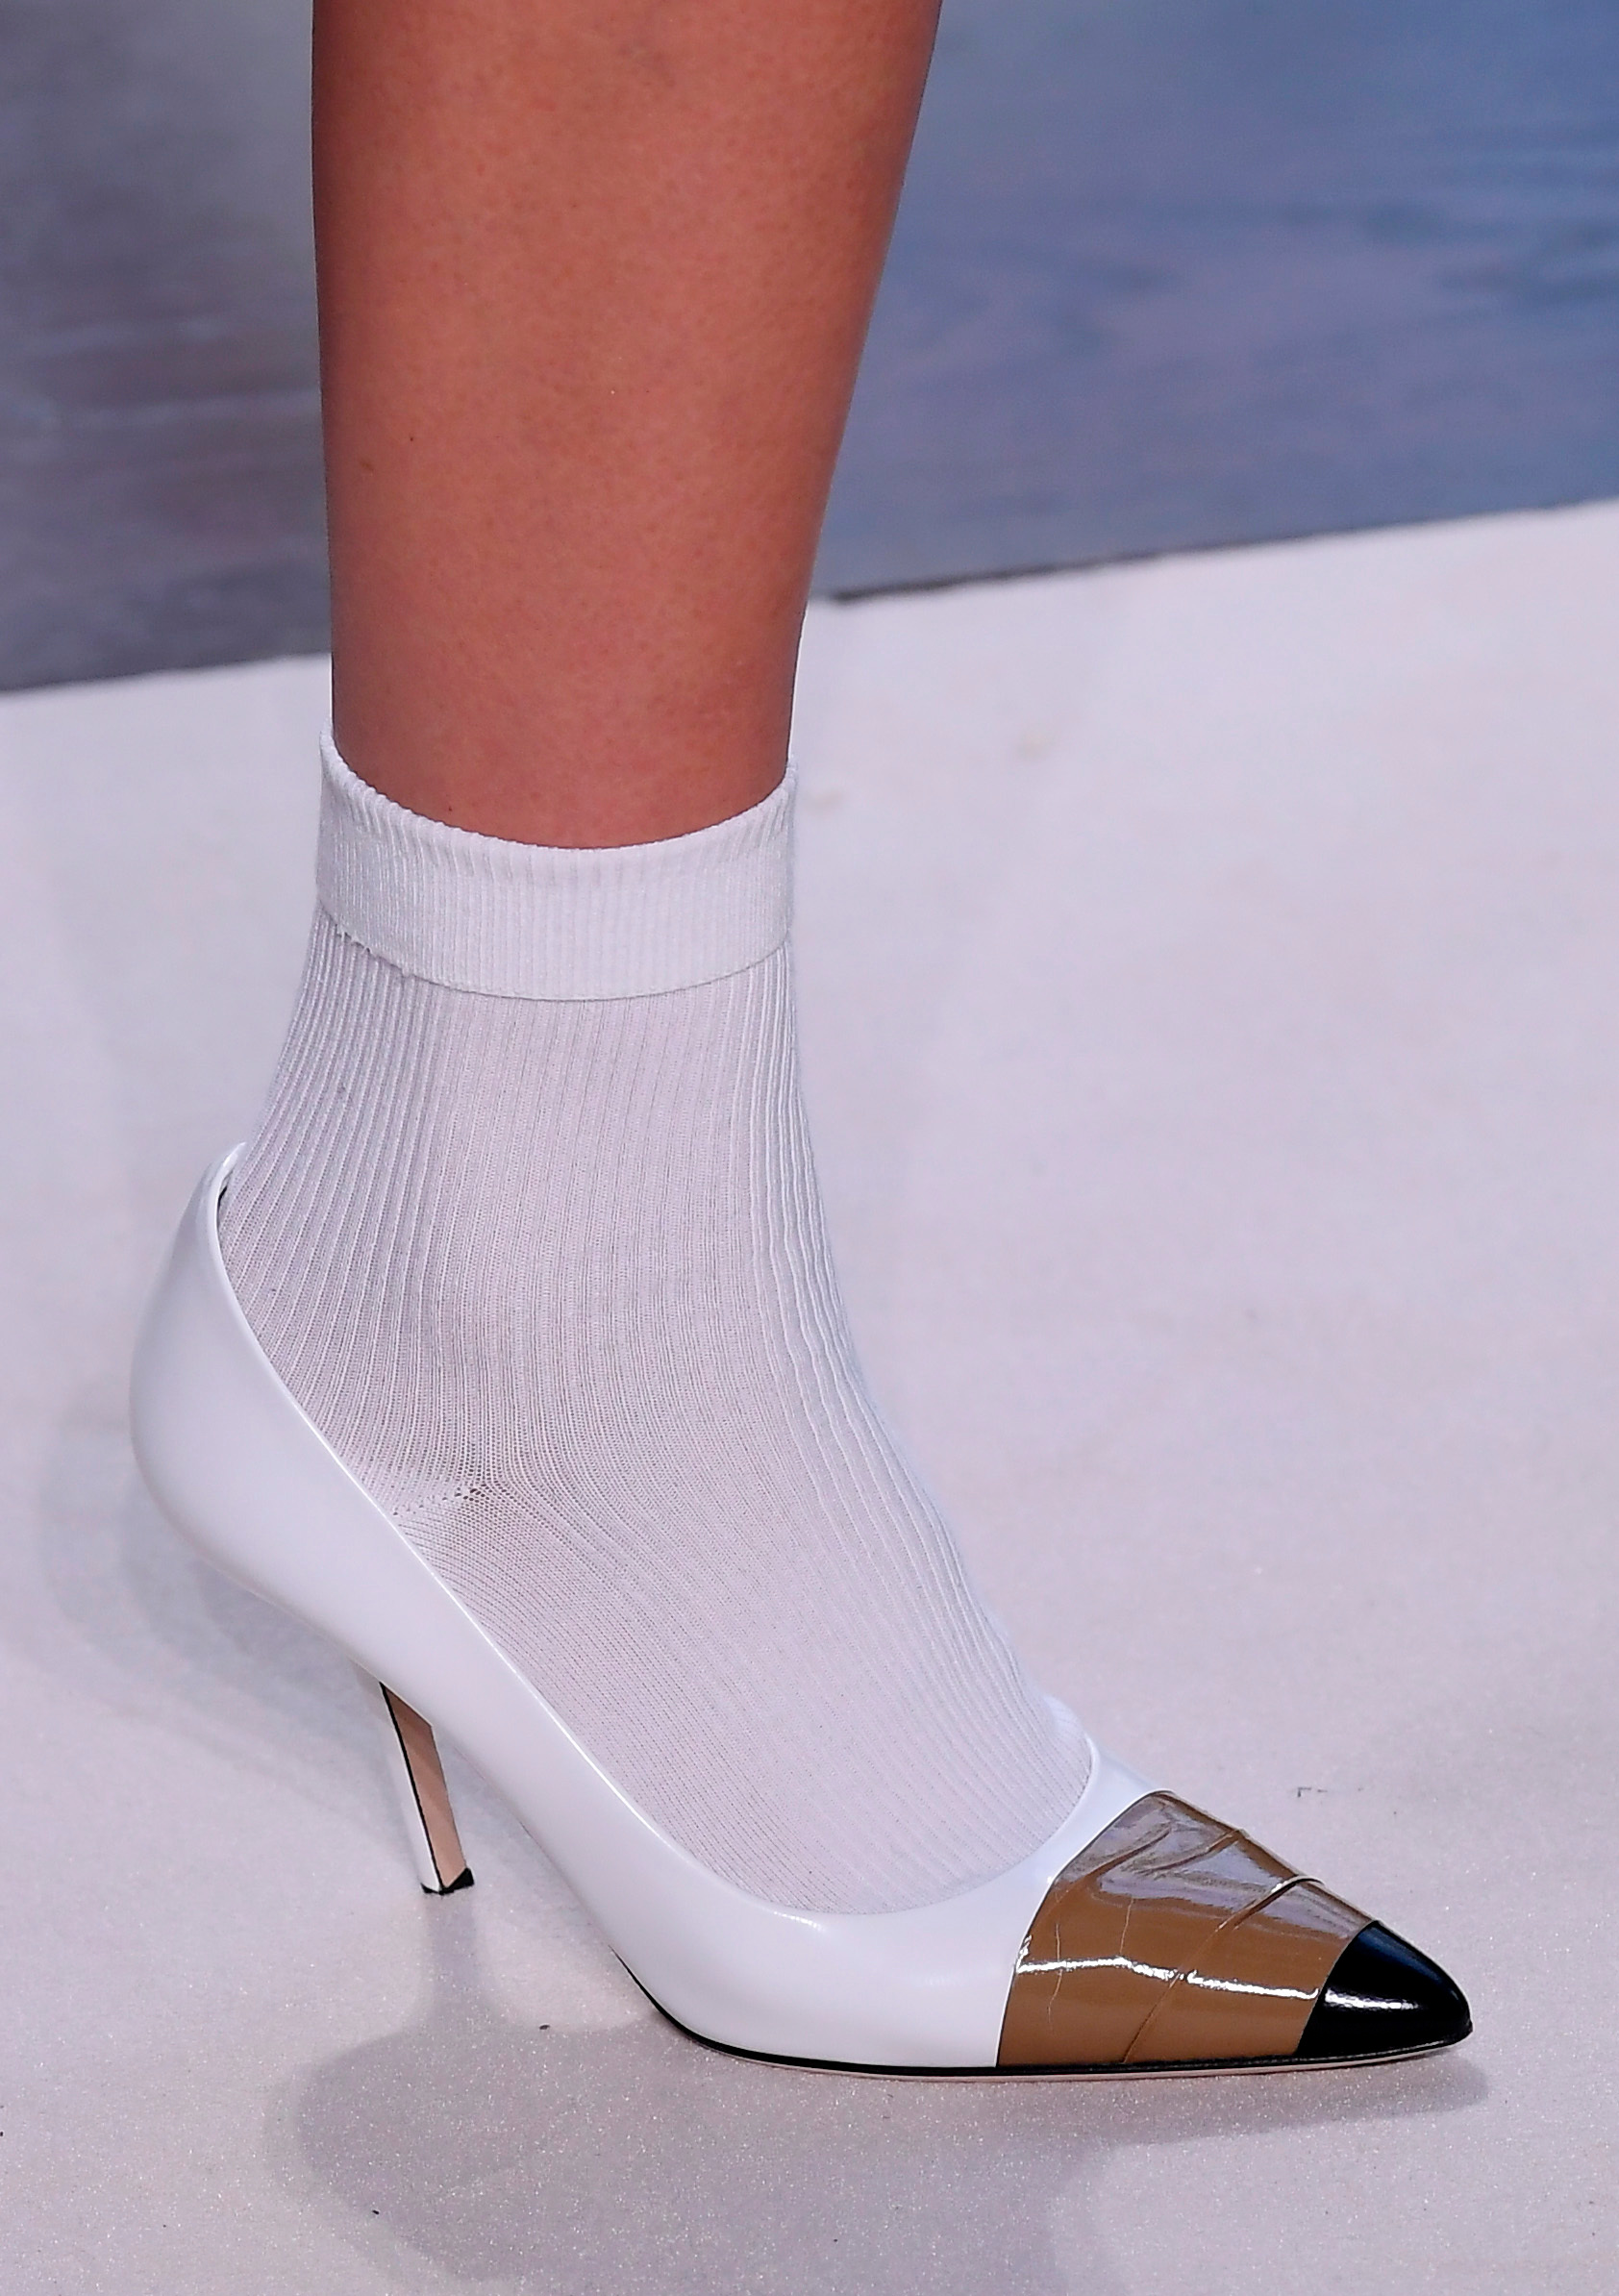 Model on the catwalk, shoe detailBurberry show, Detail, London Fashion Week, UK - 17 Sep 2018